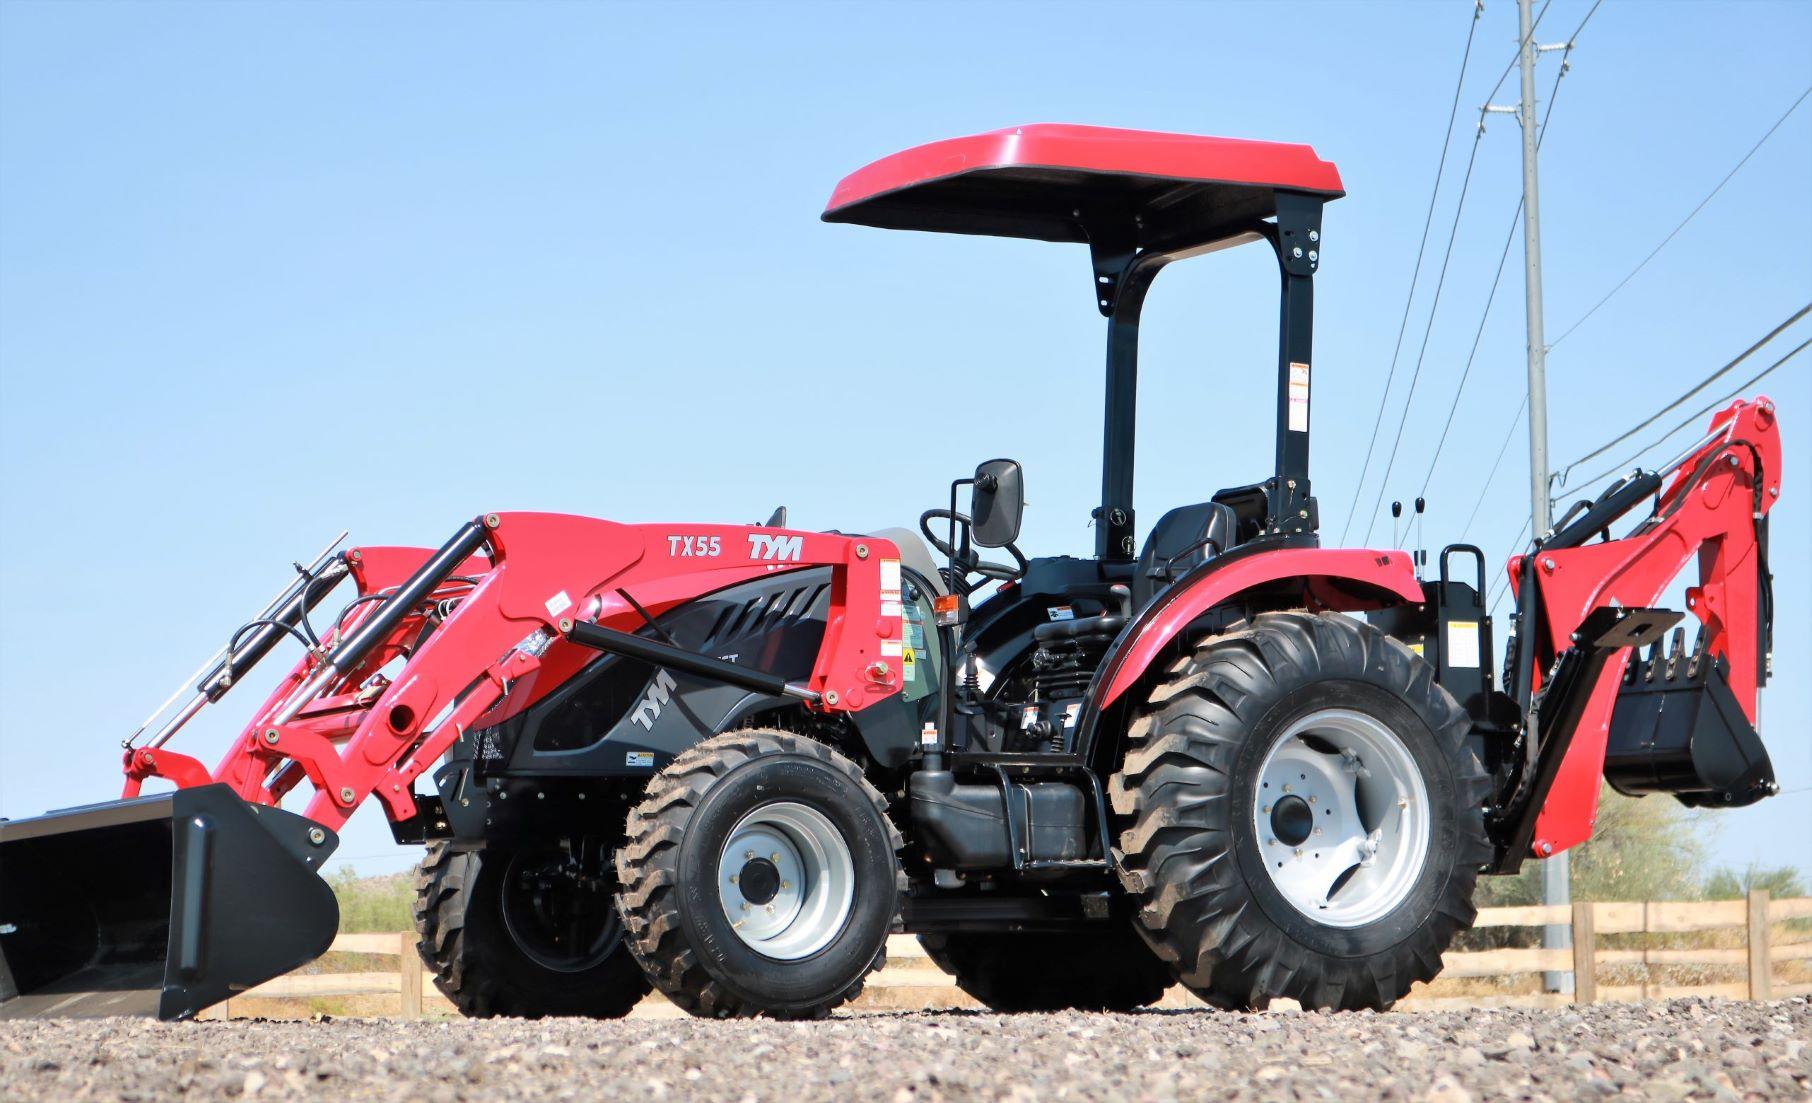 TYM Team Tractors Arizona, New Mexico, California